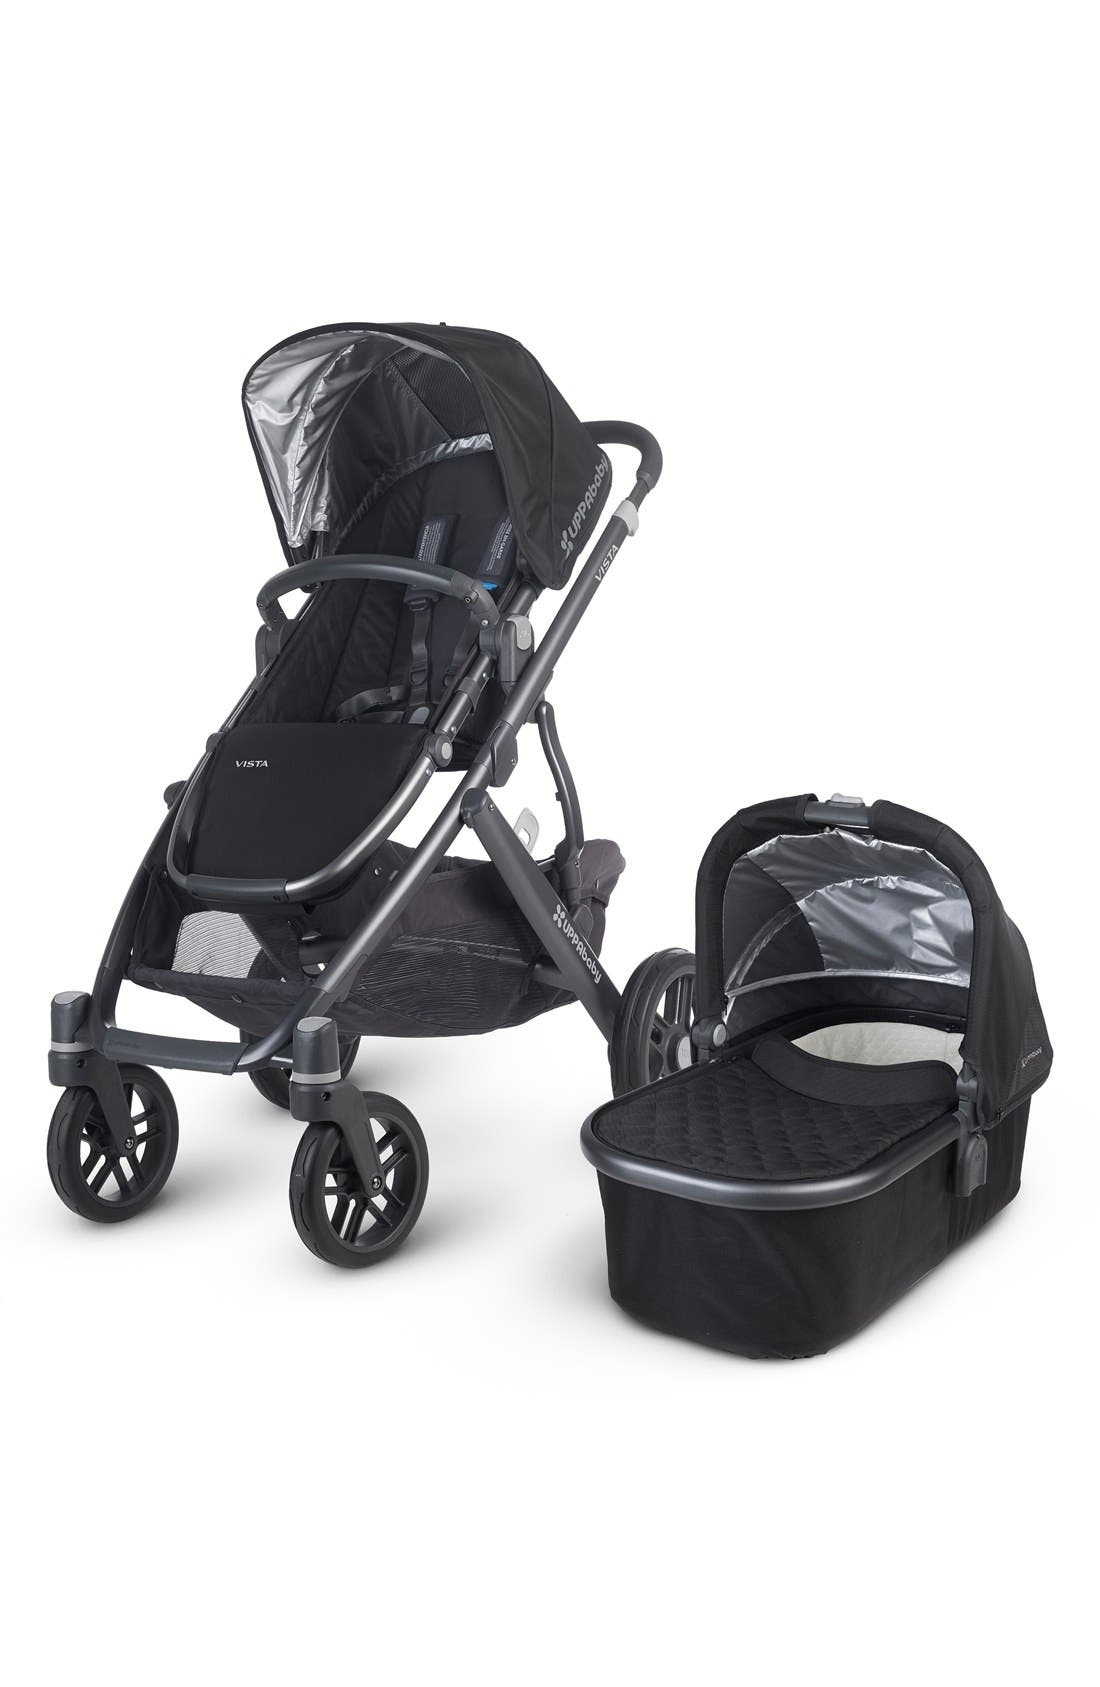 Main Image - UPPAbaby VISTA - Carbon Frame Convertible Stroller